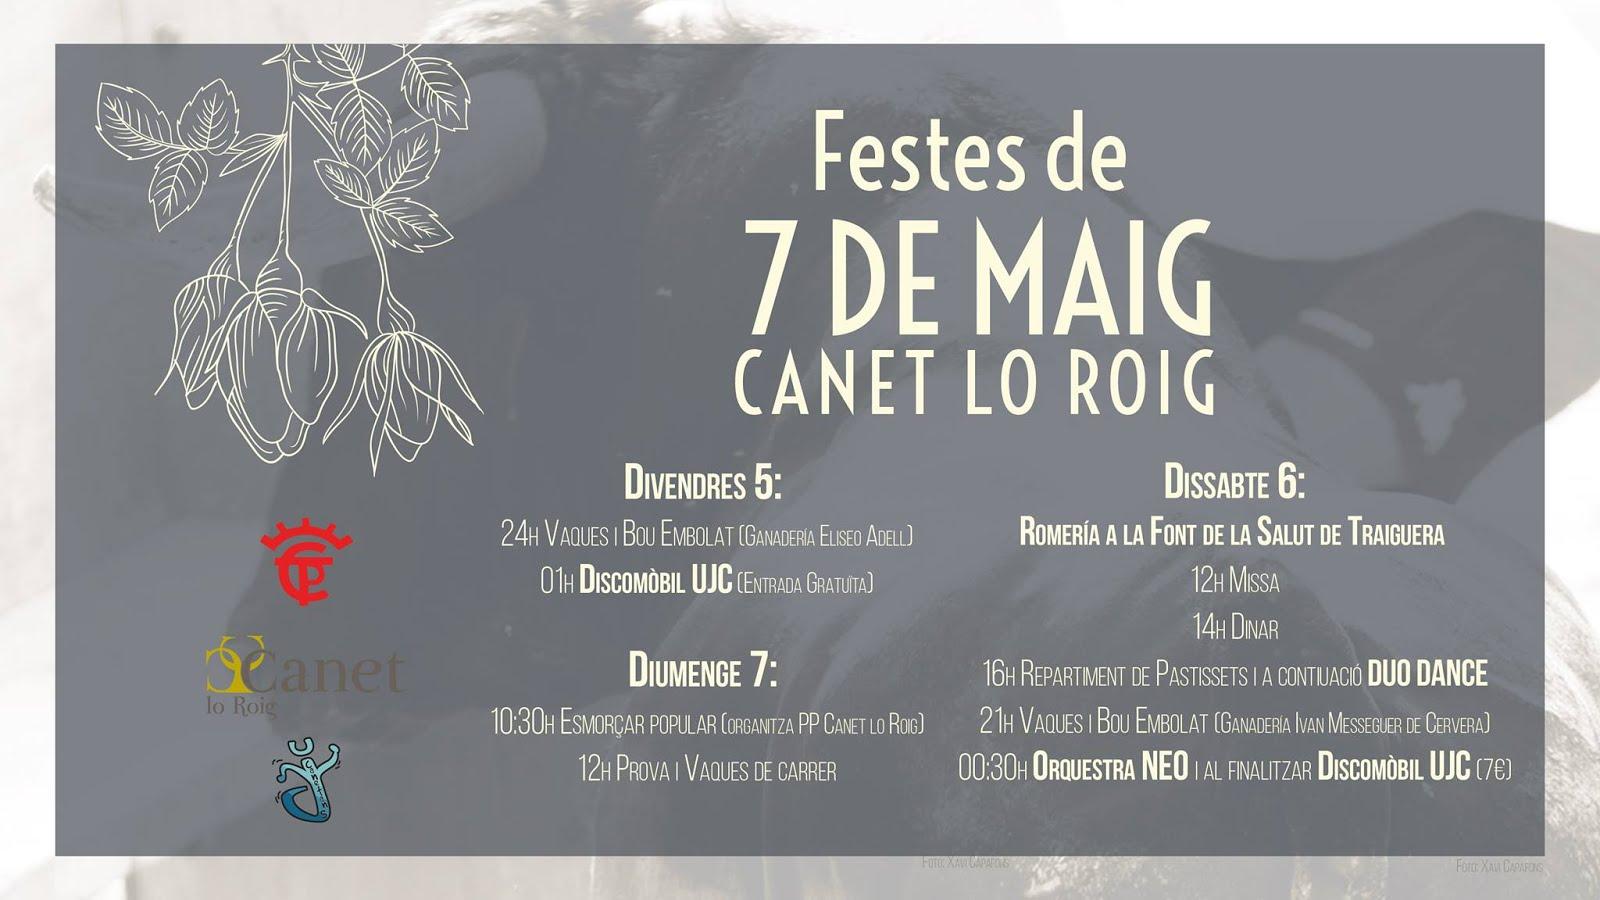 Canet lo roig fiestas mayo 2017 castell n fecartoros for Eventos madrid mayo 2017